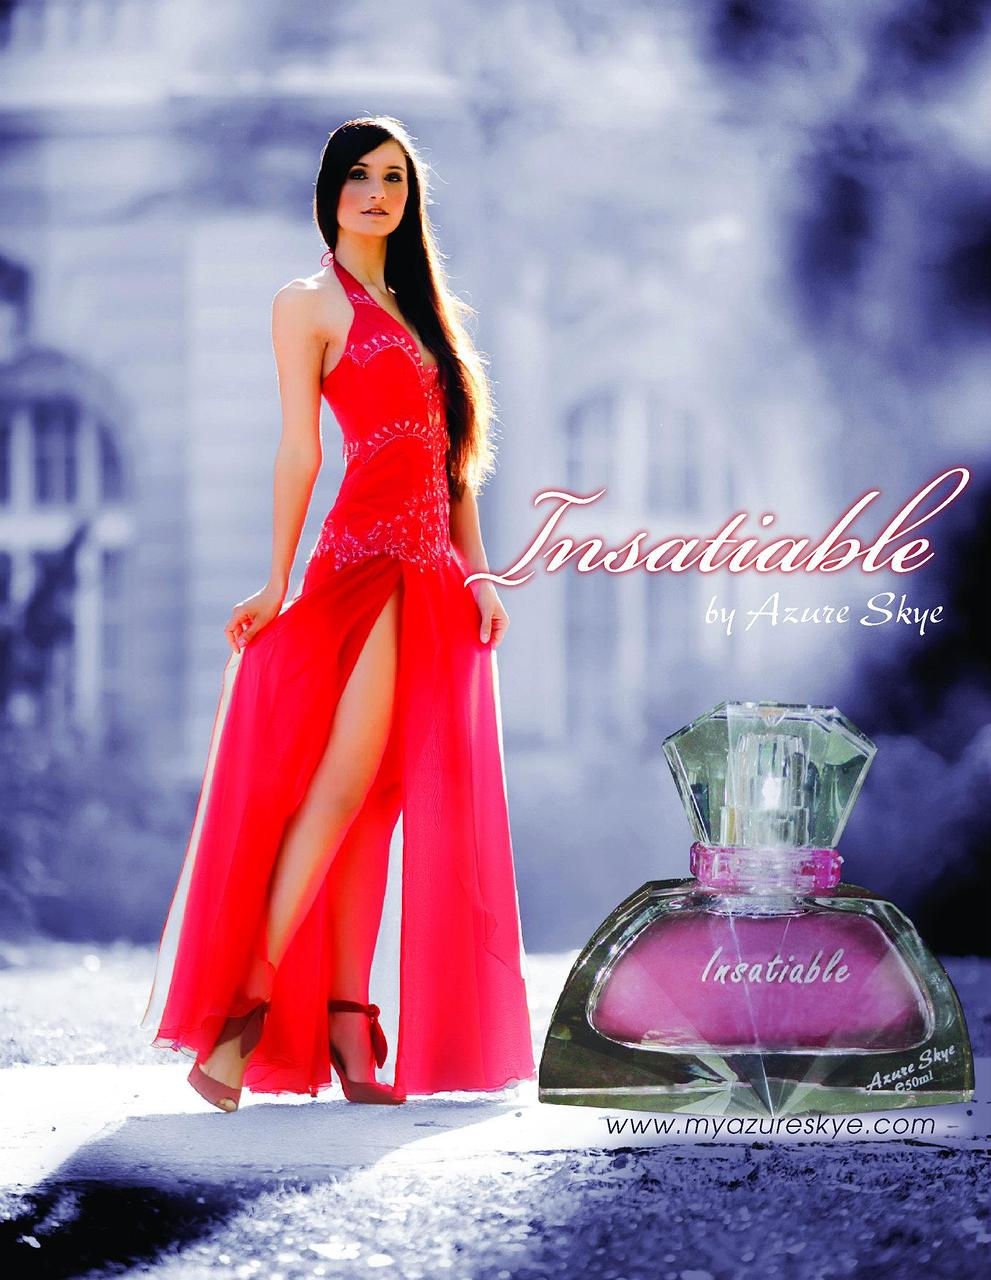 Flashbackfridays Gail Oneill also Pastel Accessories also Si Rose Signature Elie Saab Le Parfum Resort Oscar De La Renta Extraordinary Petale besides Oscar Flor 29667 in addition Cid3629. on oscar perfume in stores